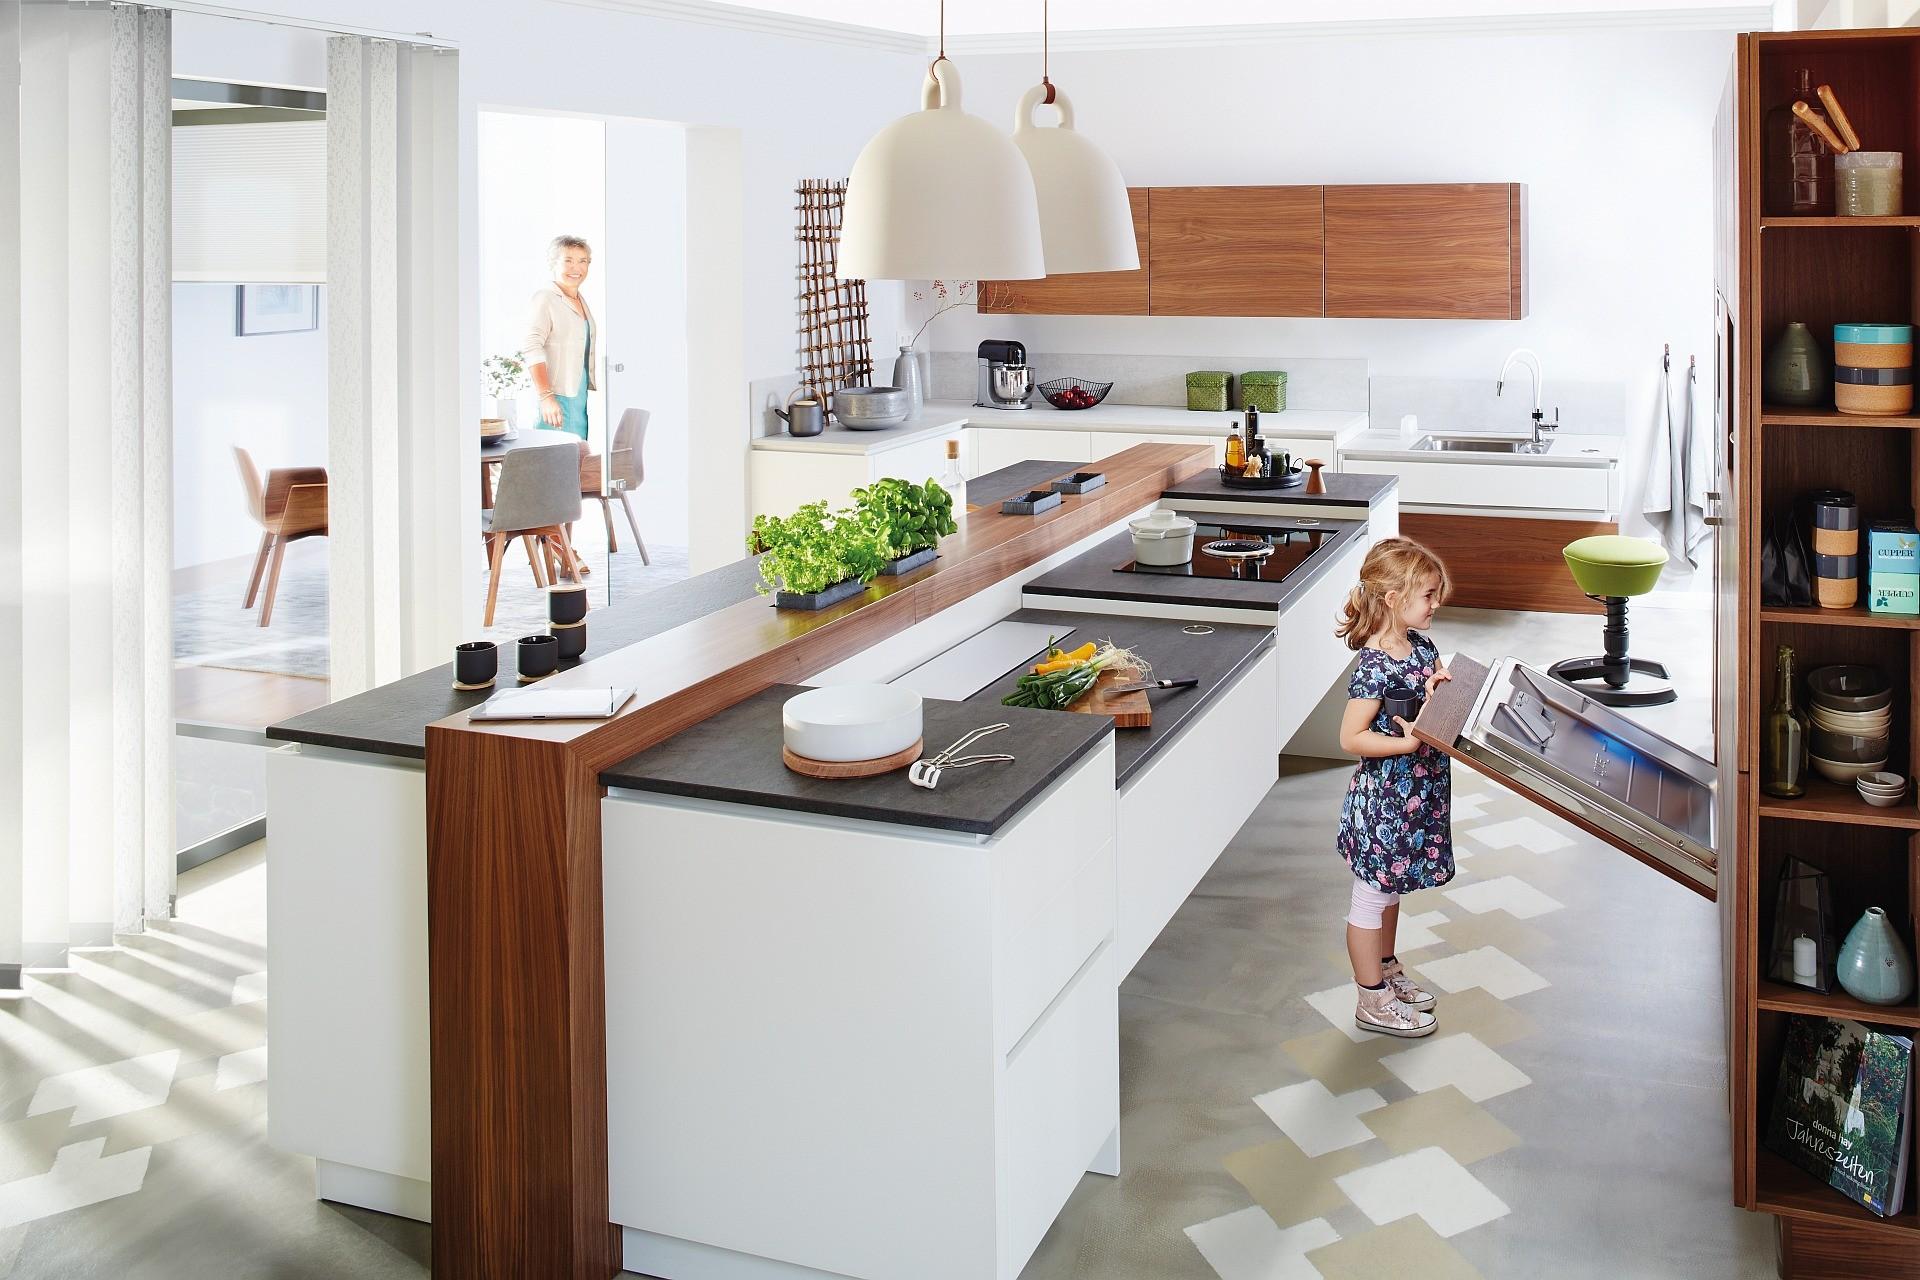 Full Size of Stehhilfe Küche Baby Stehhilfe Küche Kinder Stehhilfe Küche Ikea Stehhilfe Für Die Küche Küche Stehhilfe Küche